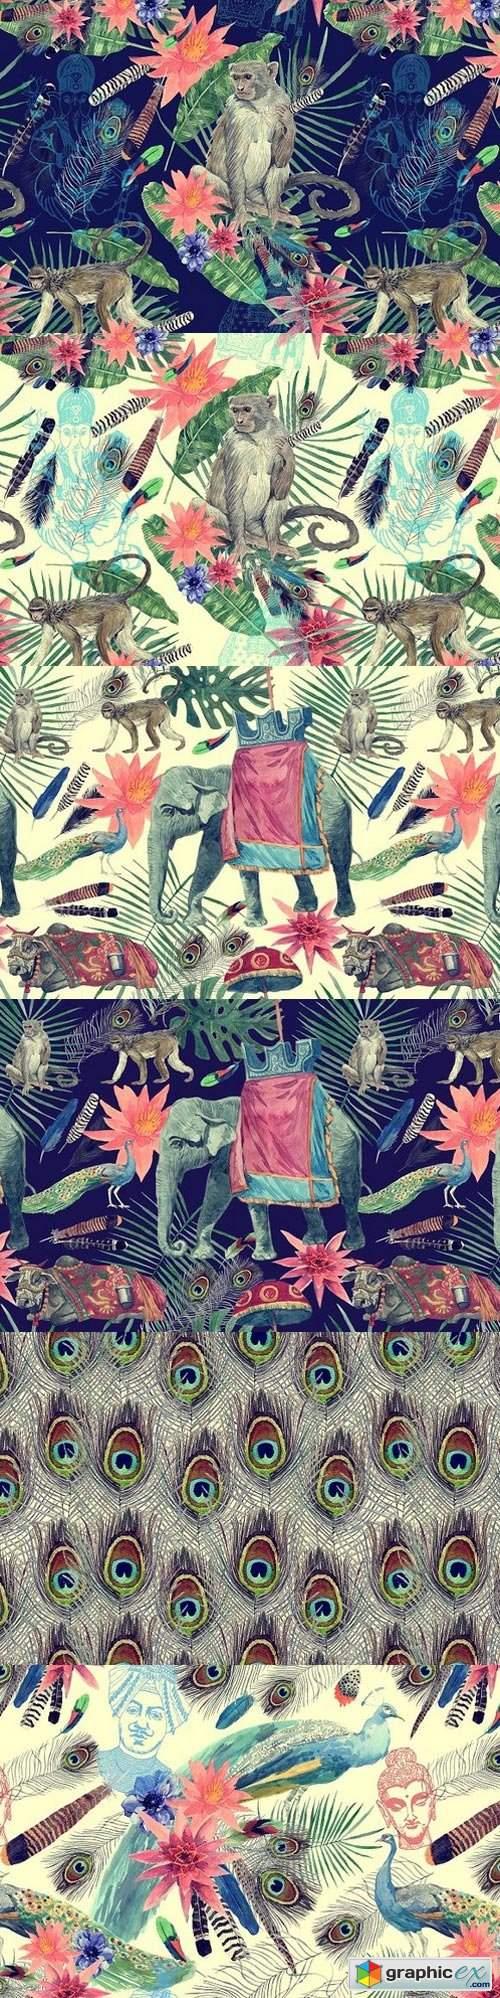 Vintage India 10 patterns (set 3)